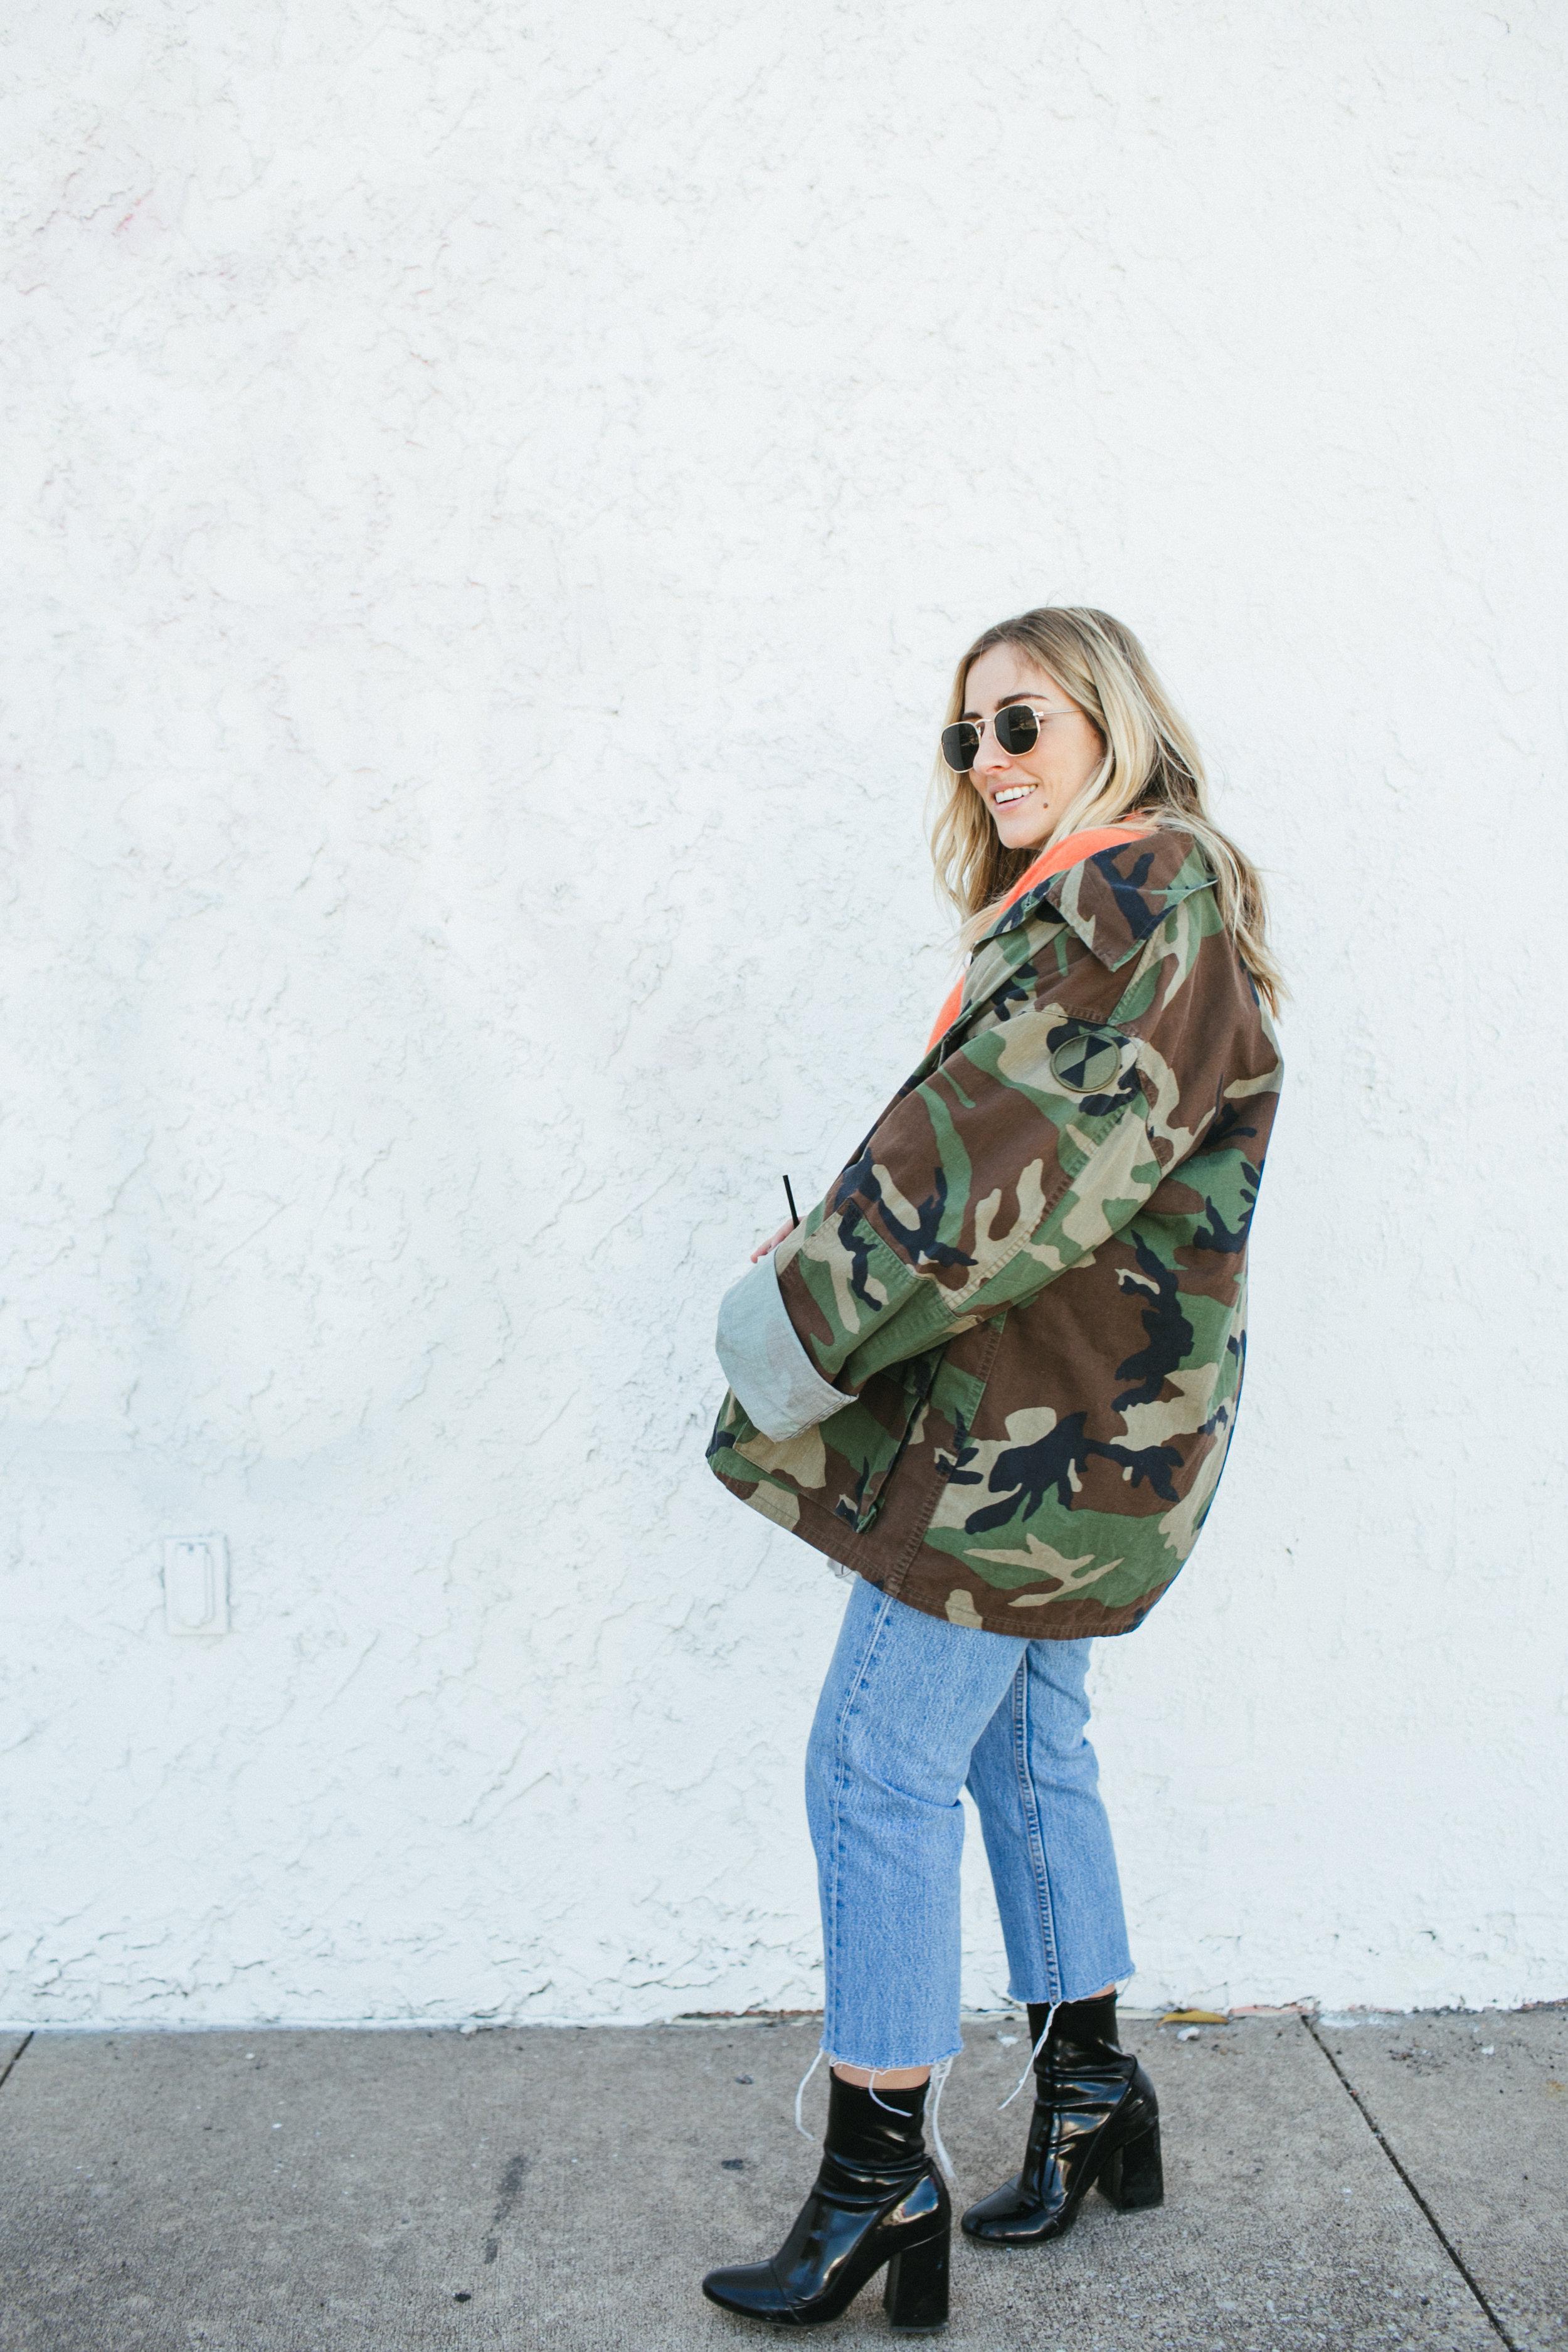 Paige-Newton-Lifestyle-Fashion-Blogger-Influencer-Photography-044.jpg